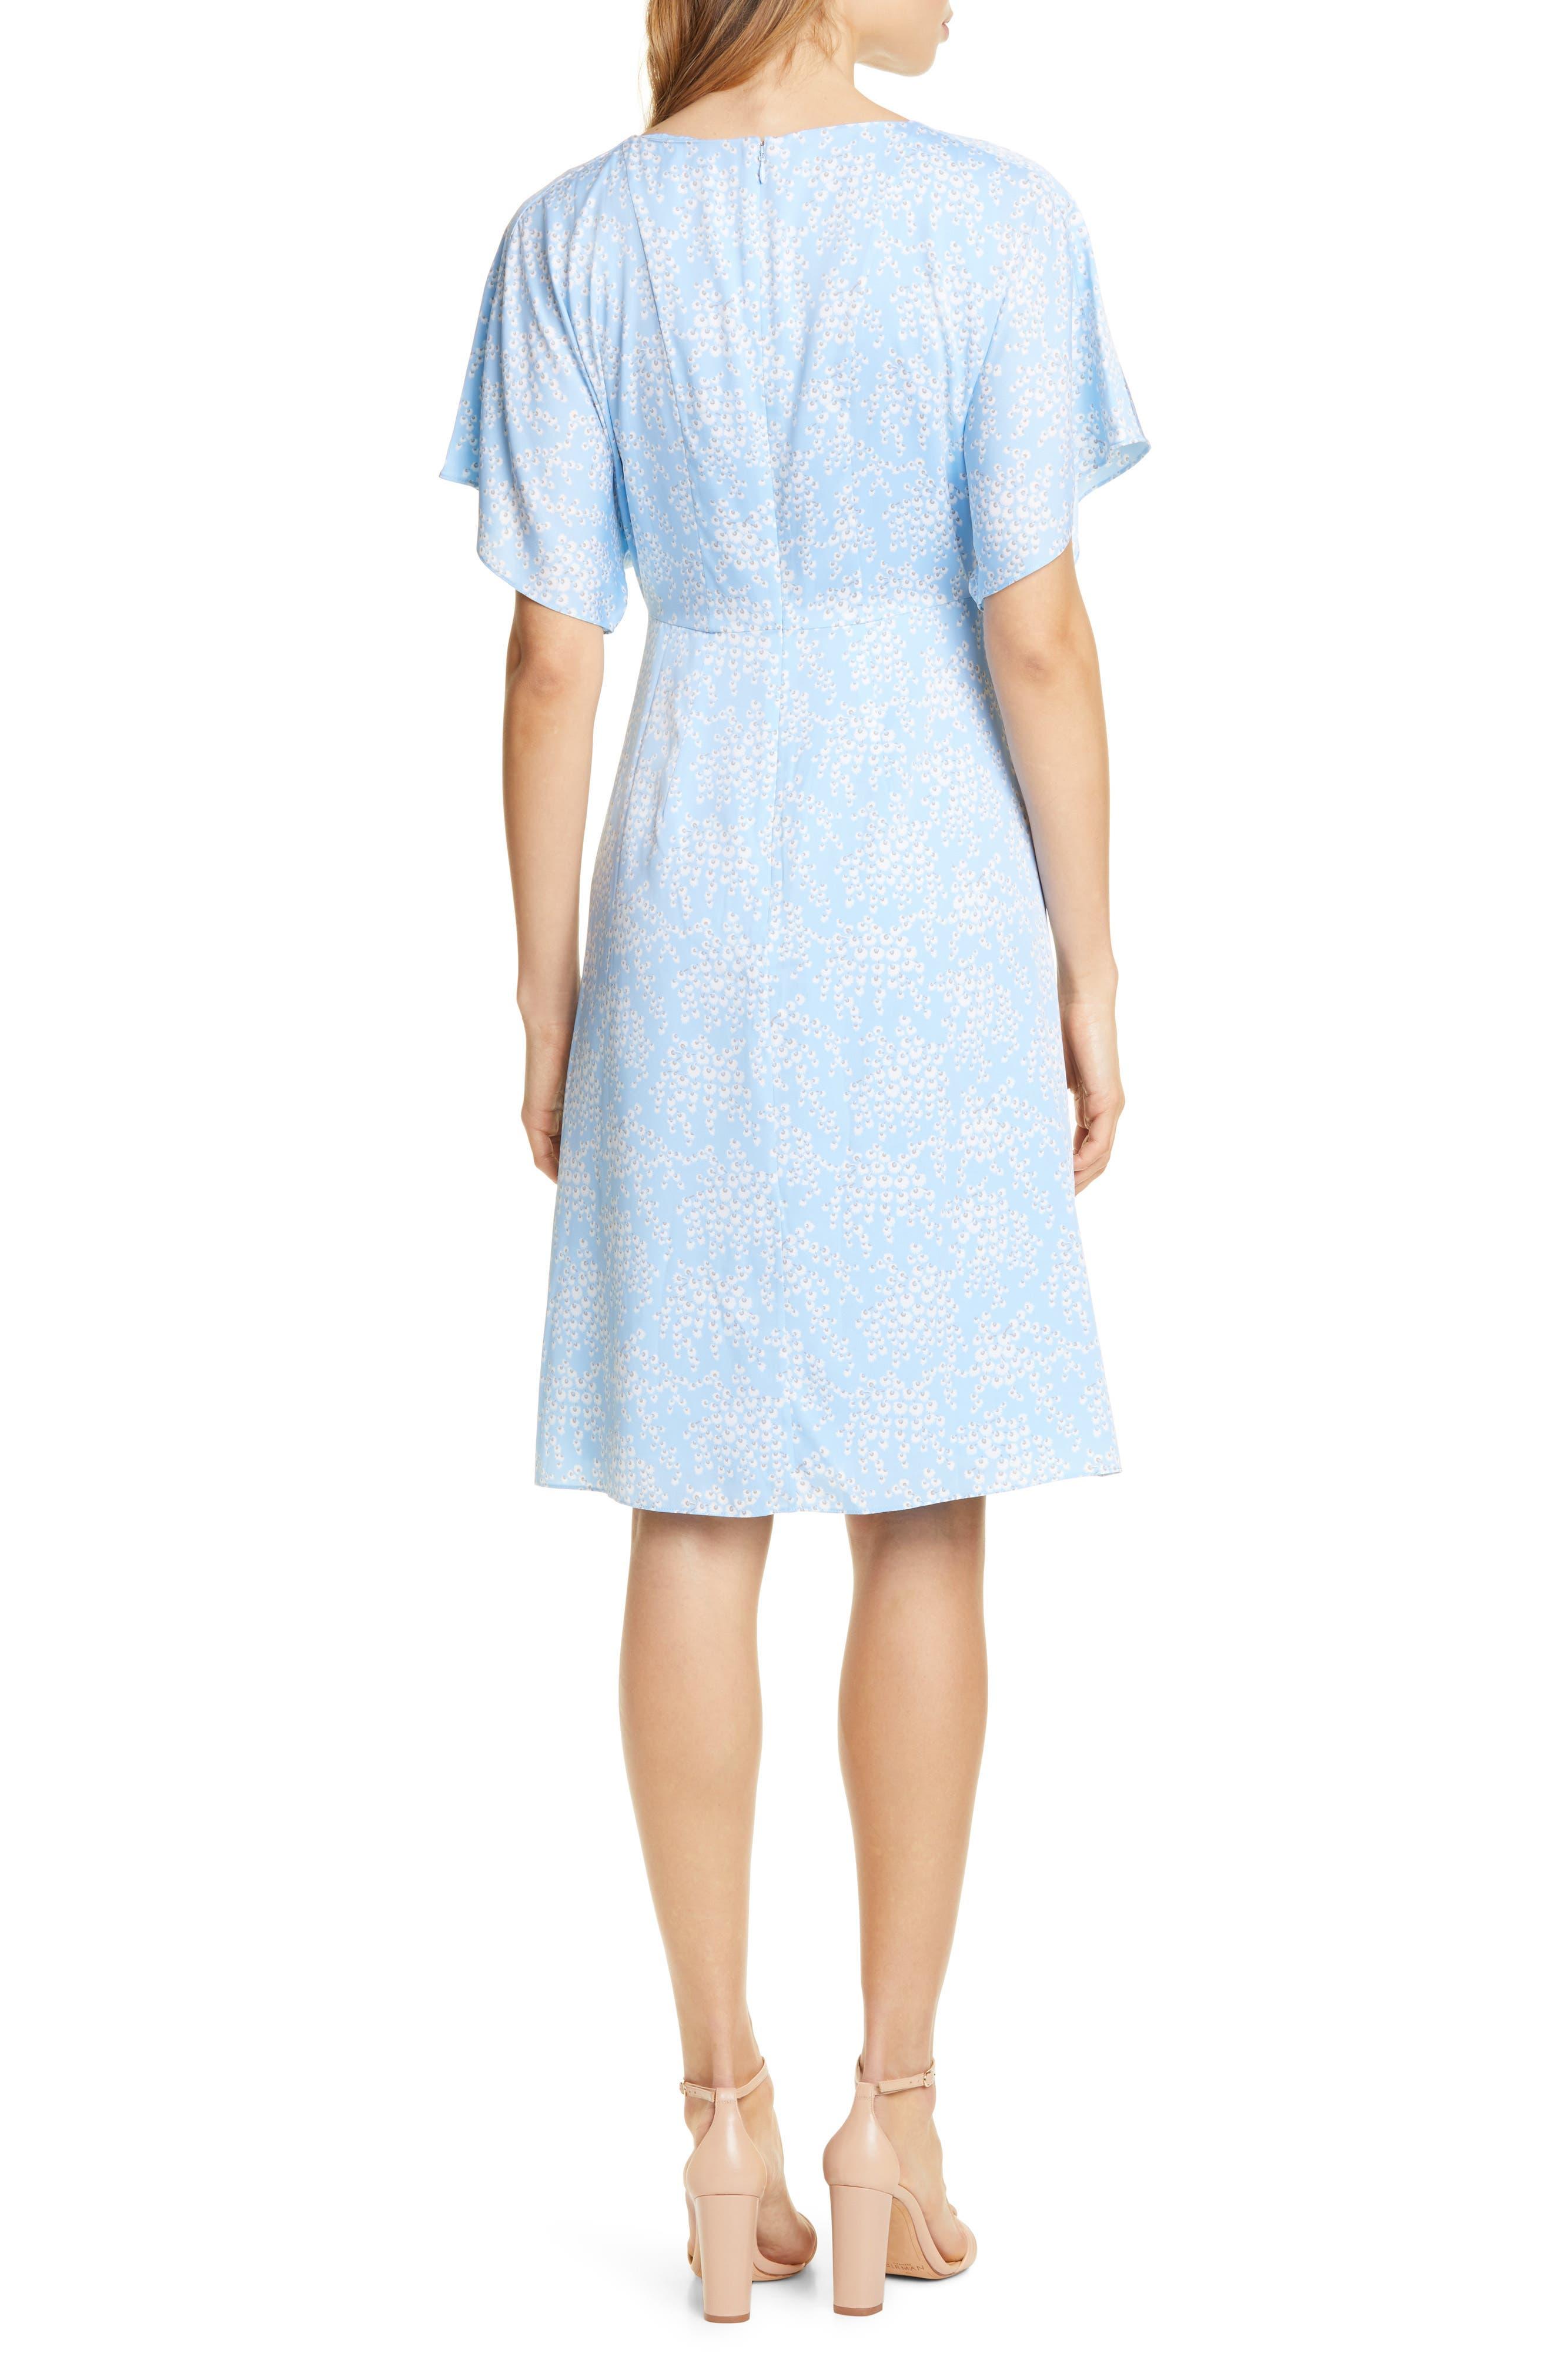 LEWIT, Kimono Sleeve Stretch Silk Dress, Alternate thumbnail 2, color, BLUE SIDDAL FLORAL